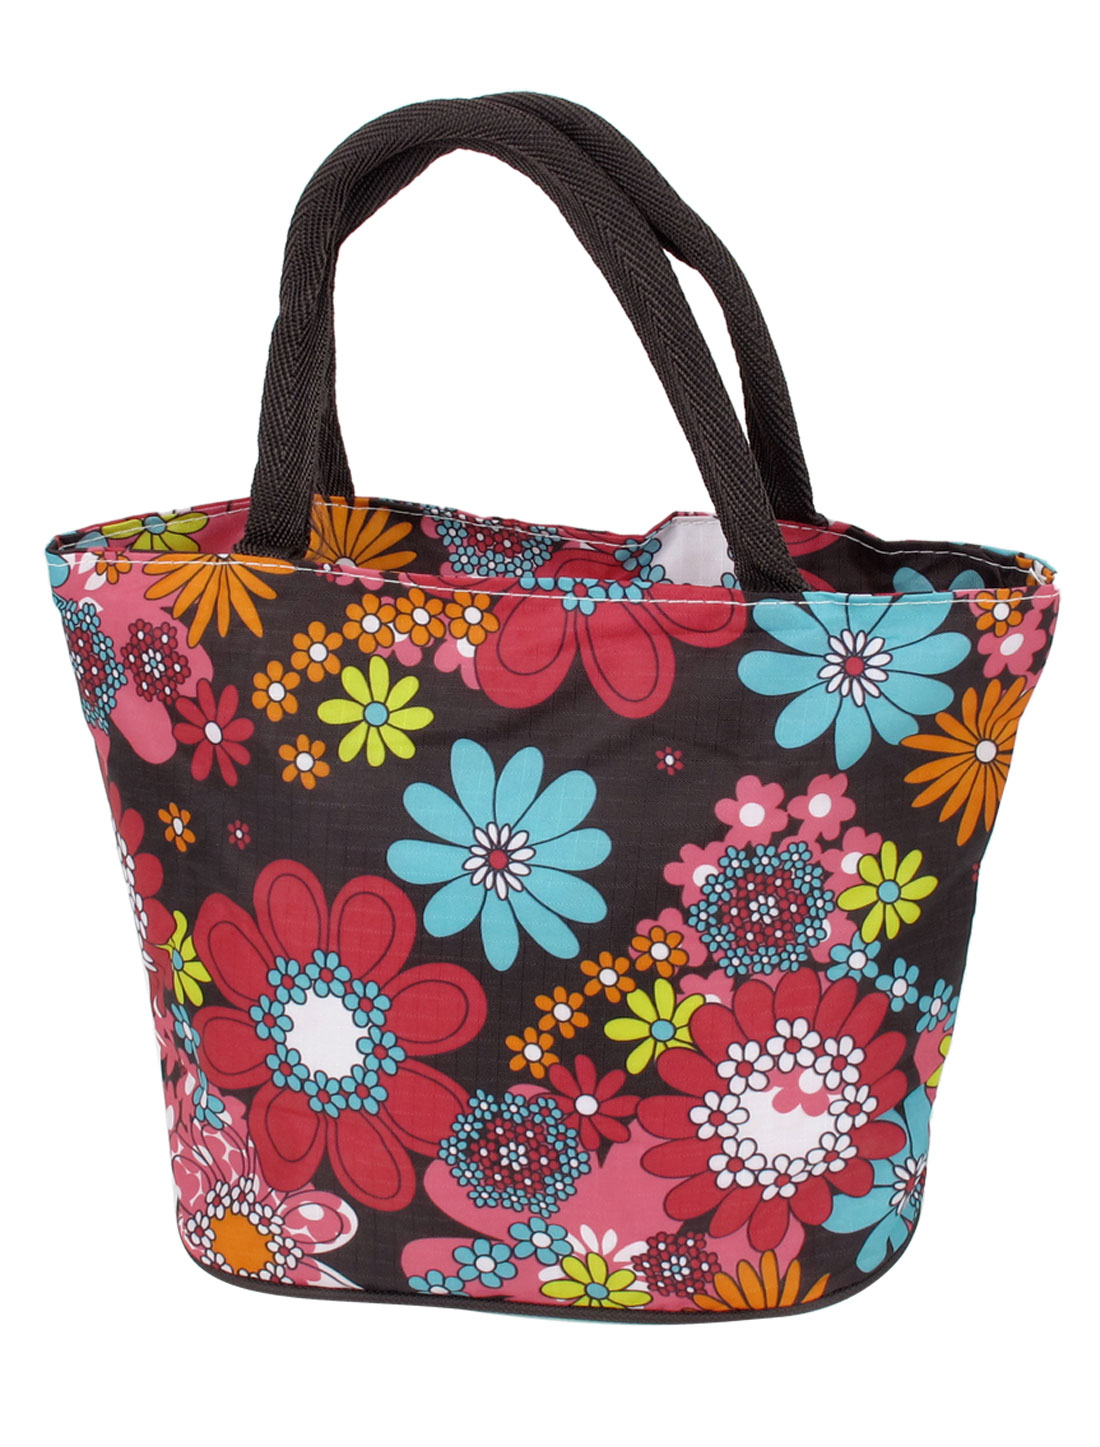 Ladies Floral Pattern Oxford Cloth Nylon Lining Zippered Handbag Tote Bag